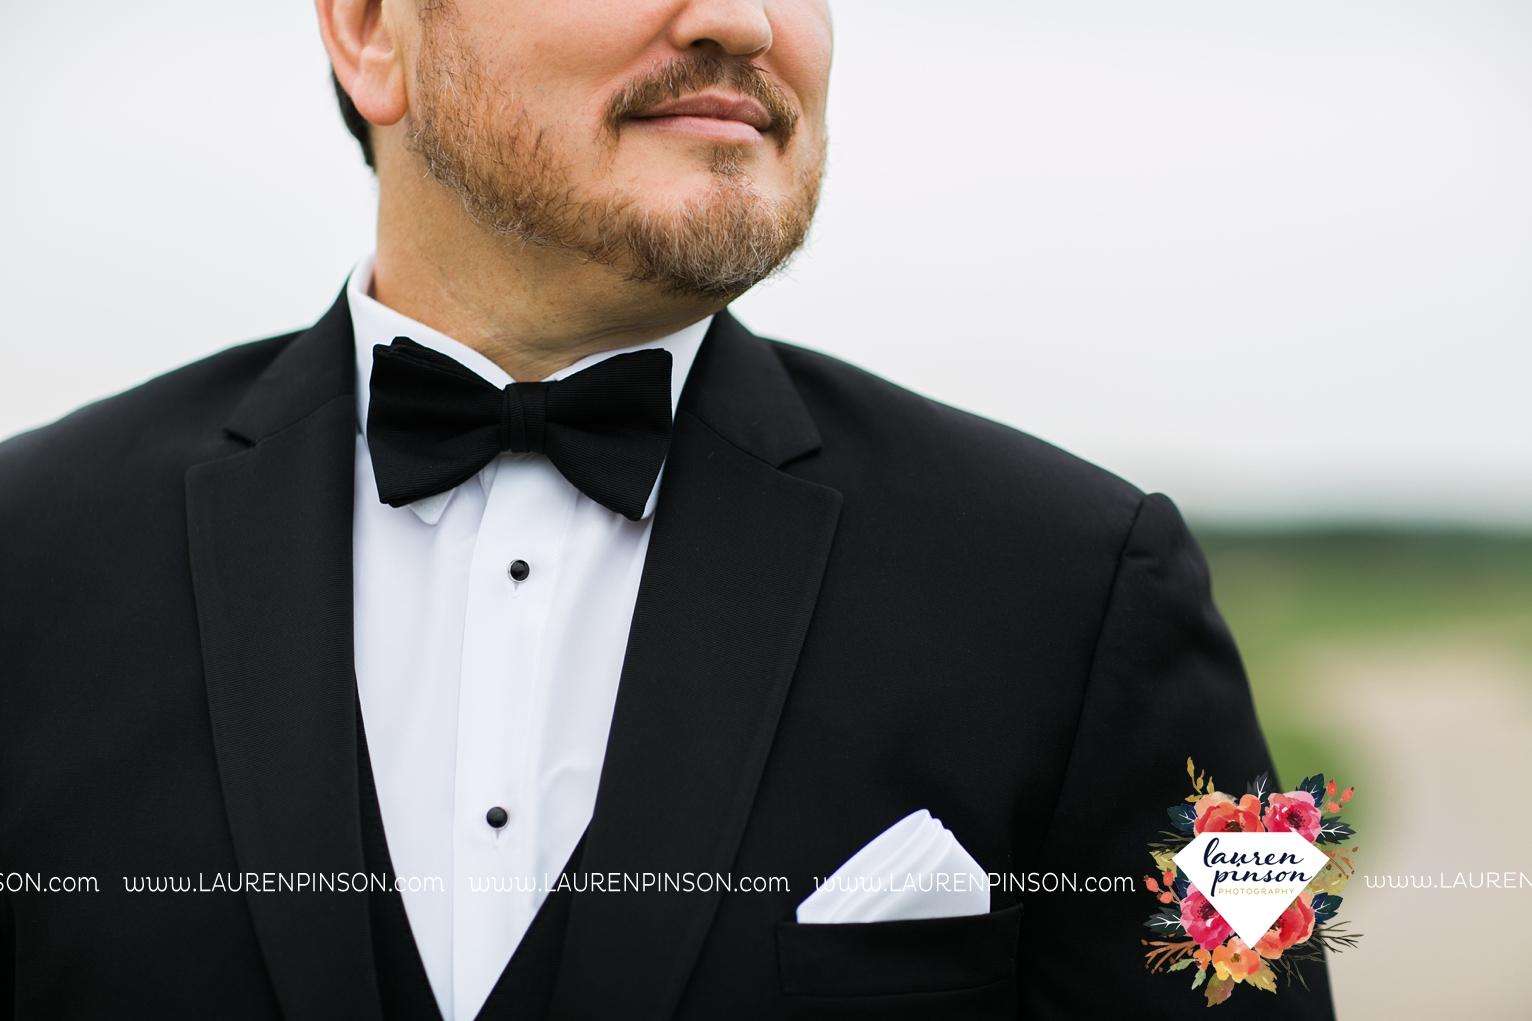 gainesville-texas-sherman-texas-thackerville-oklahoma-wedding-photographer-at-winstar-casino-golf-resort_2271.jpg